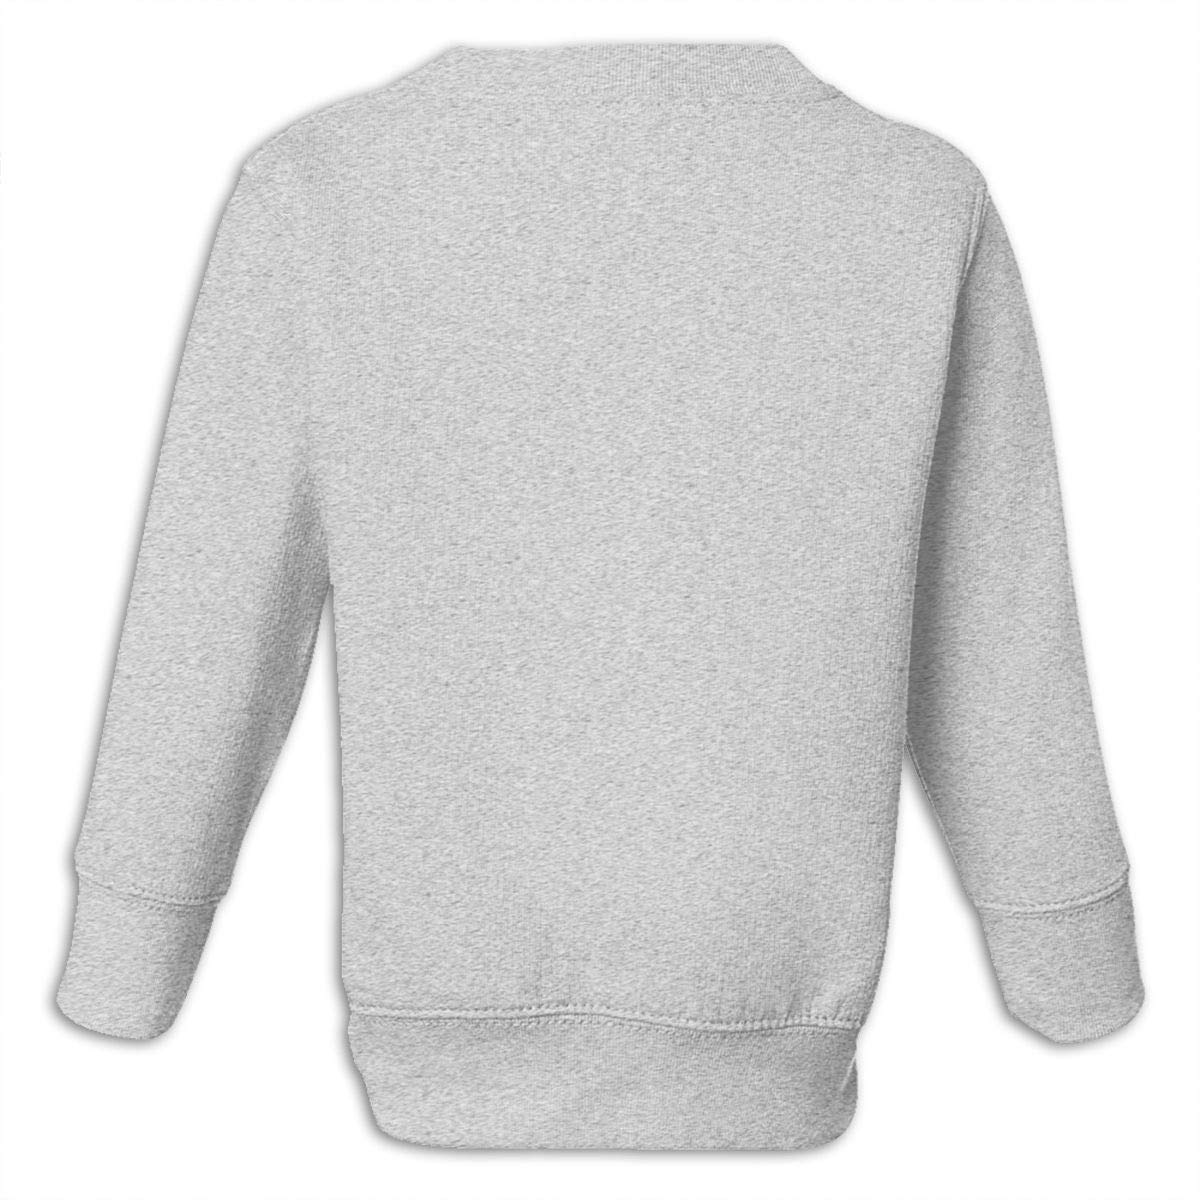 Yuliang Groom Girl Fashion Sweater Gray